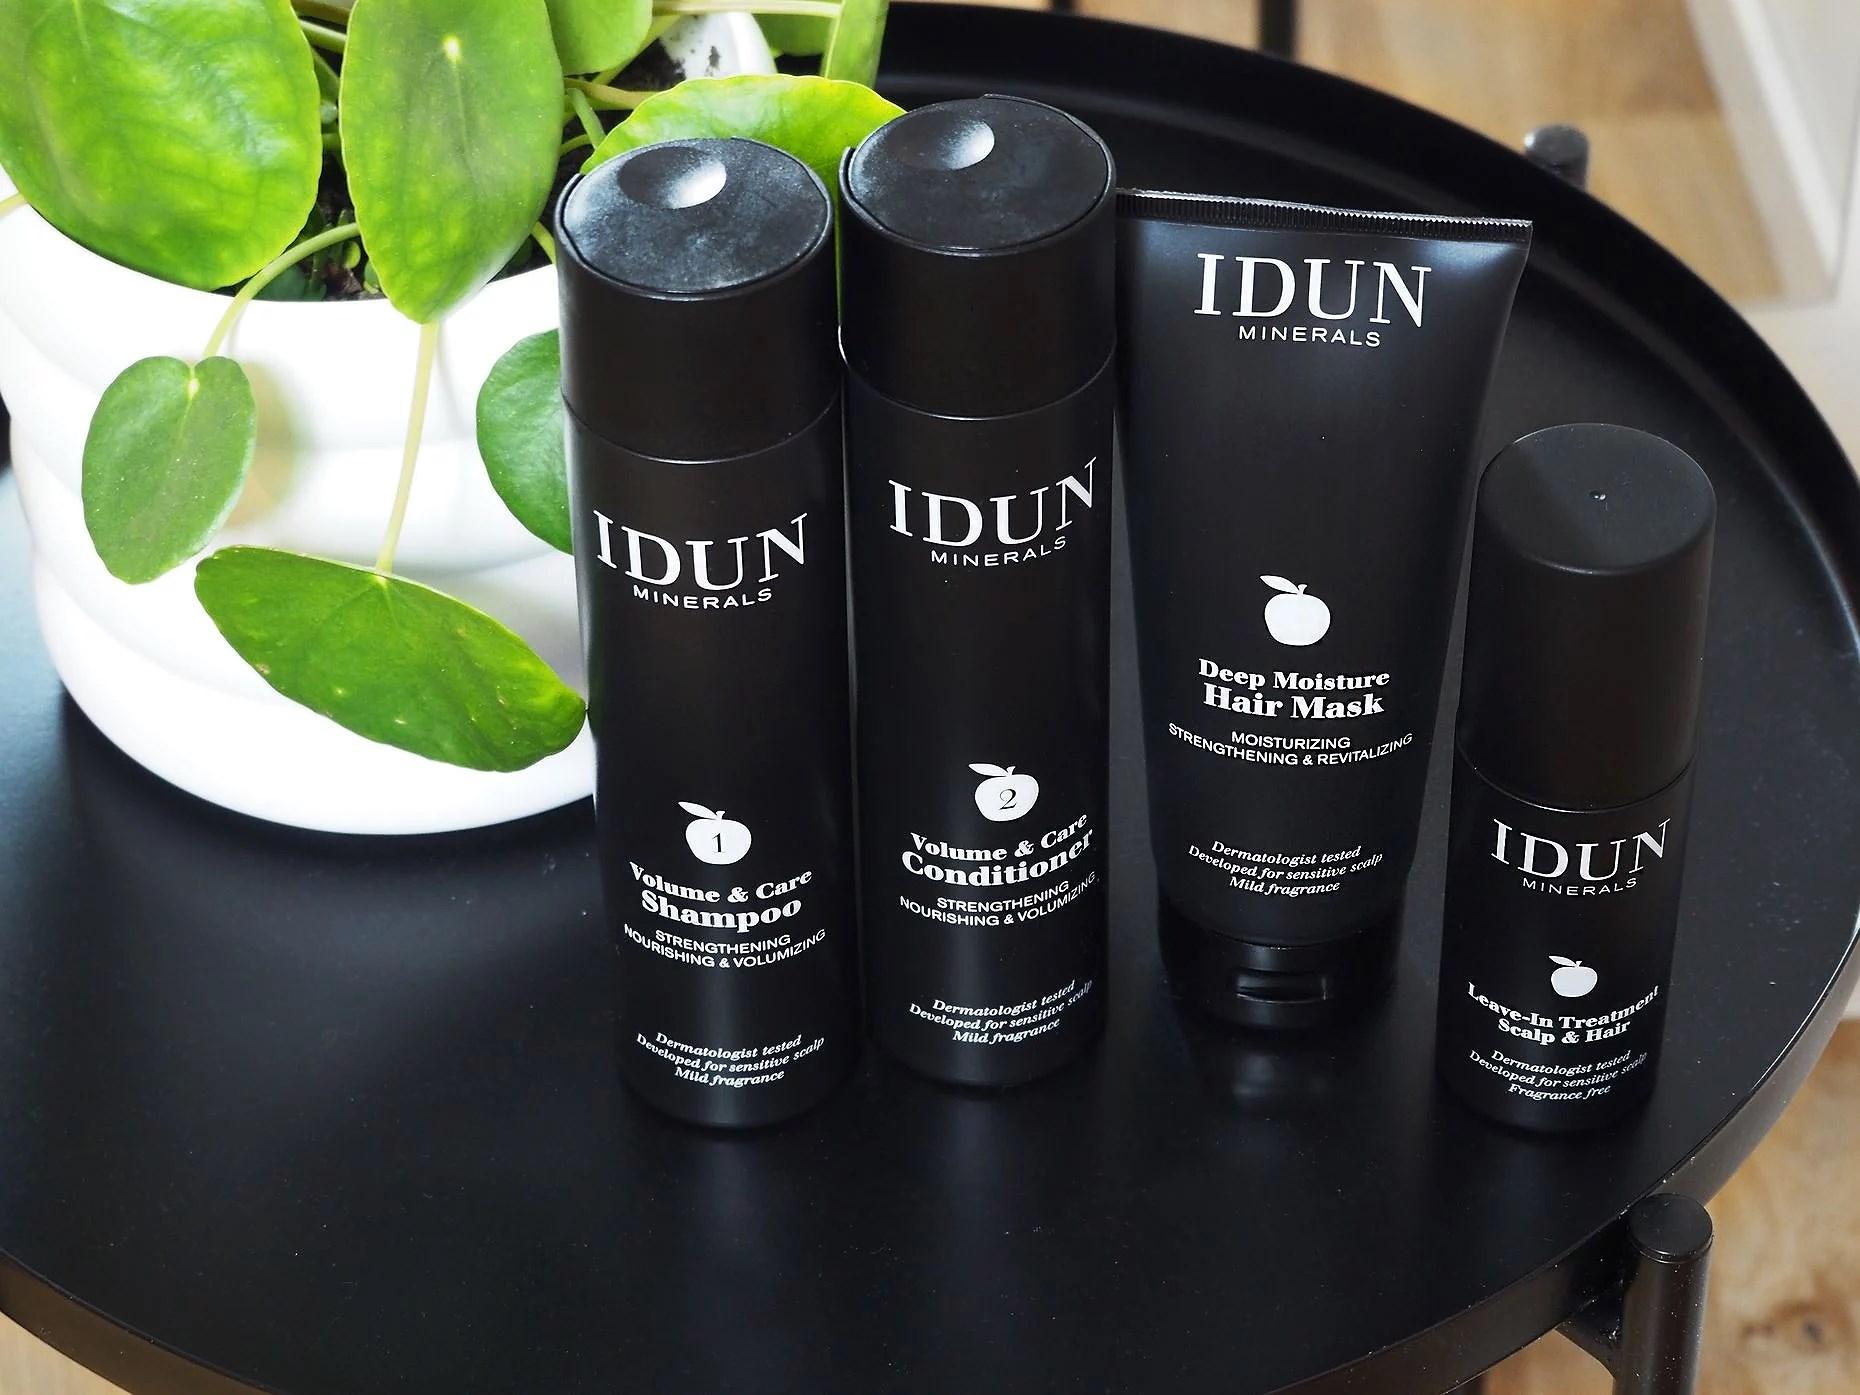 IDUN MINERALS HAIR PRODUCTS